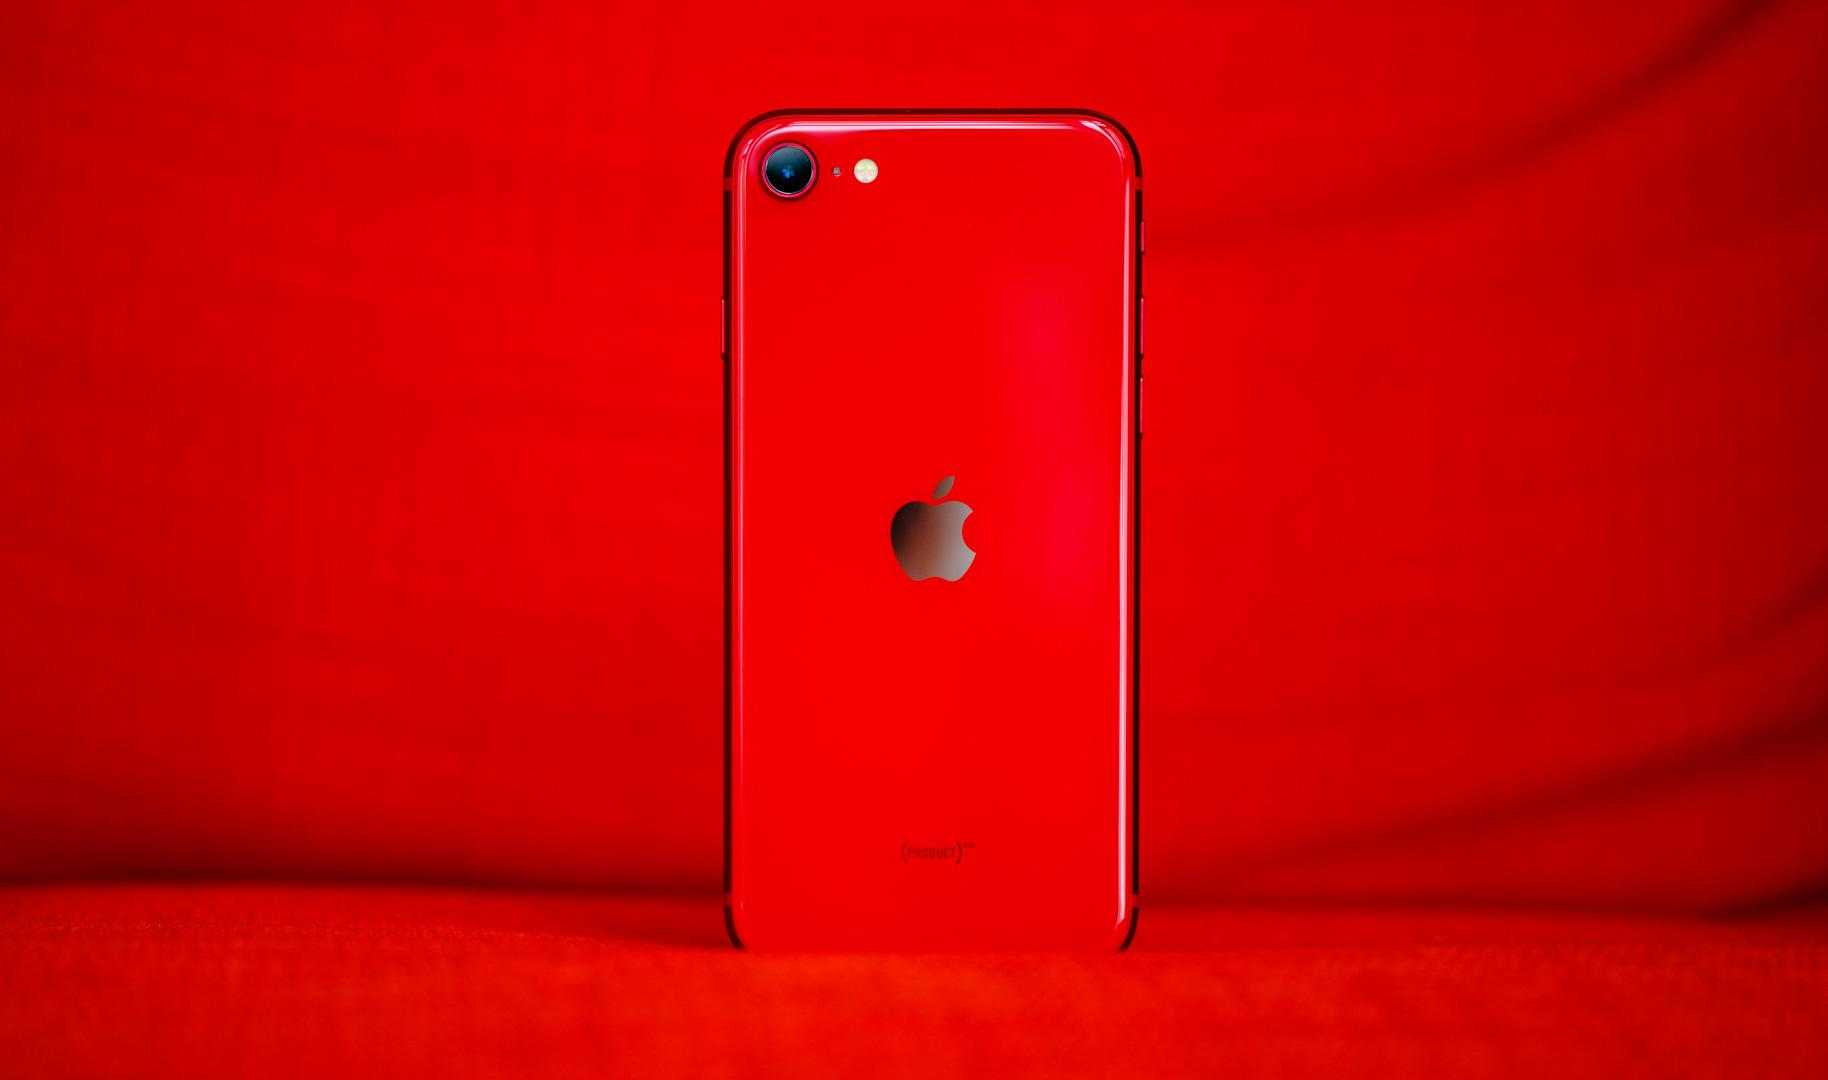 iPhone SE back straight on